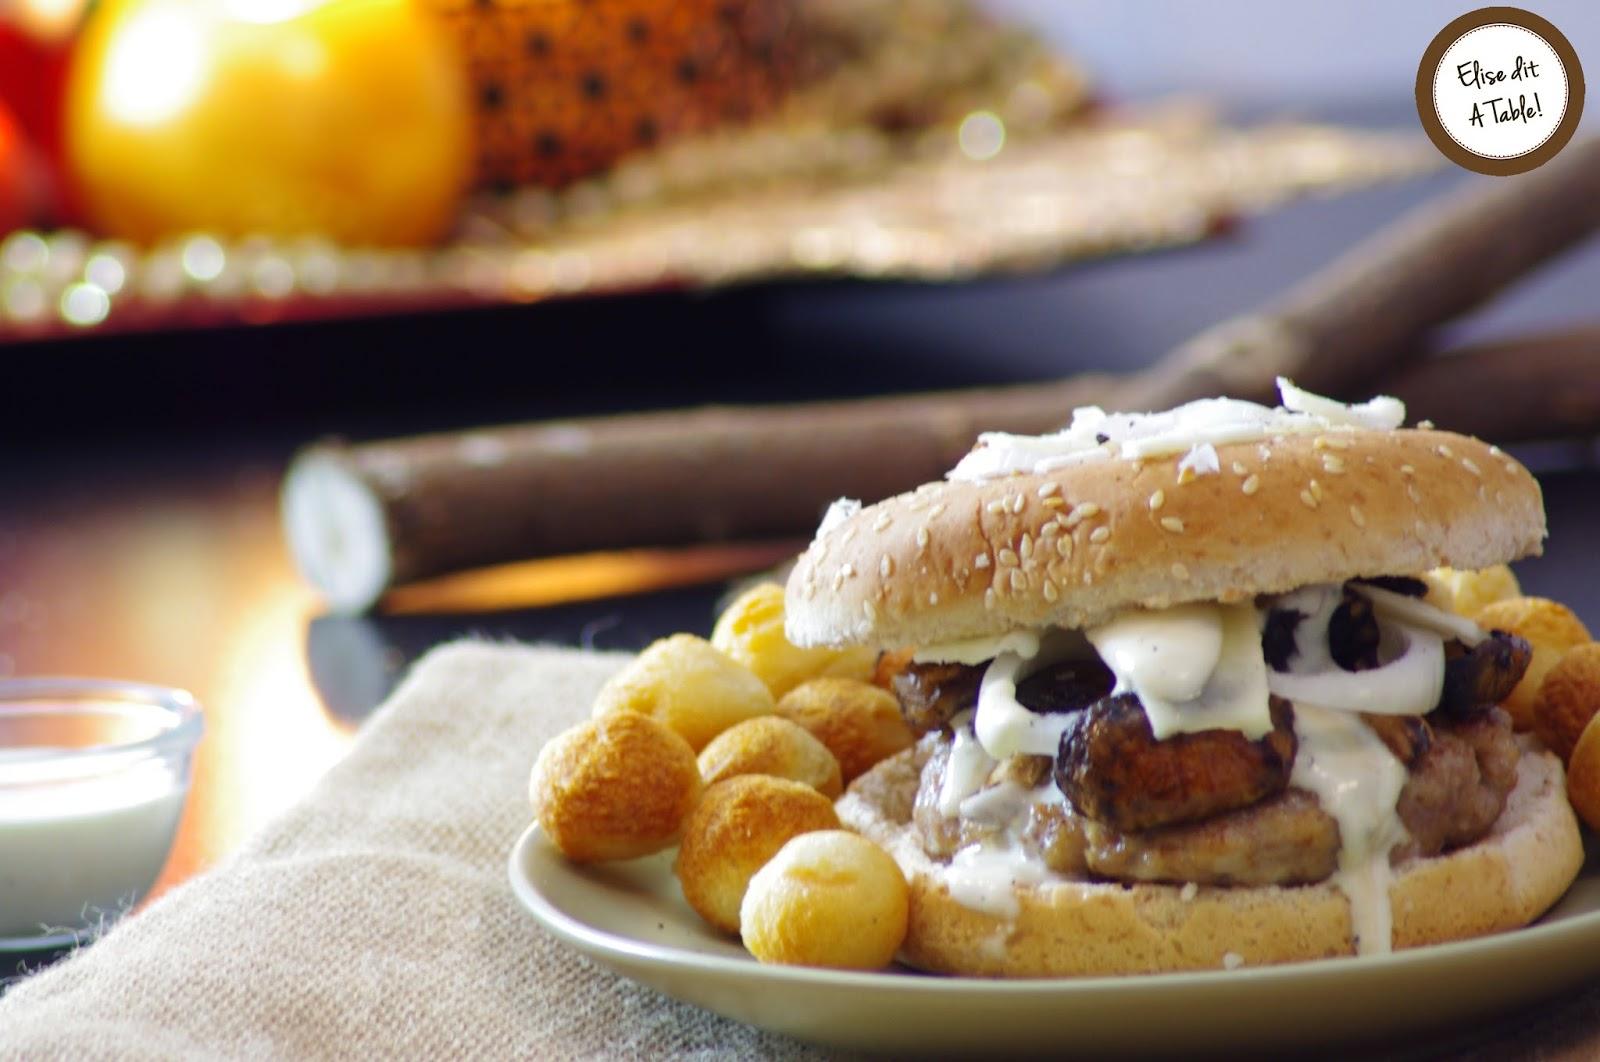 recette Hamburger à l'ossau iraty